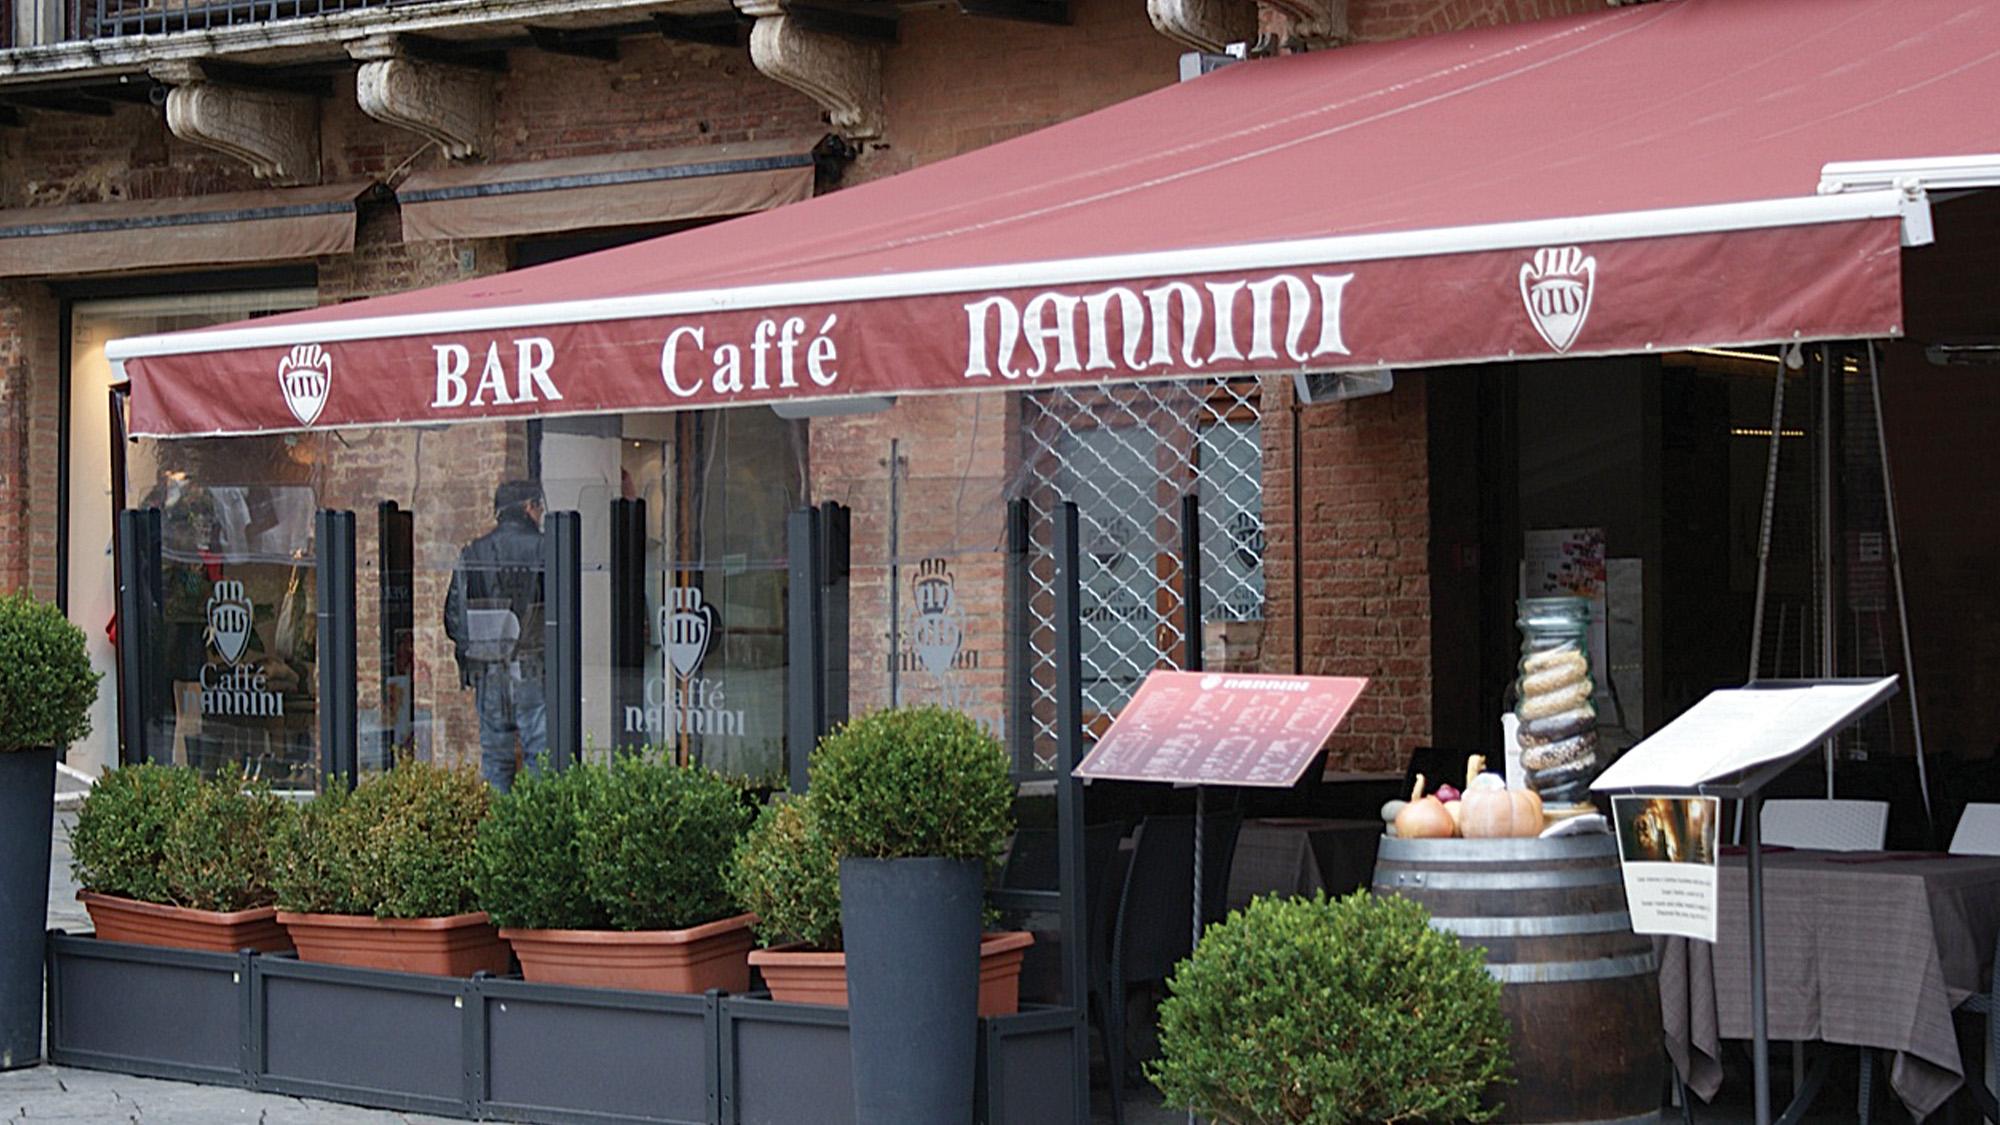 Nannini cafe